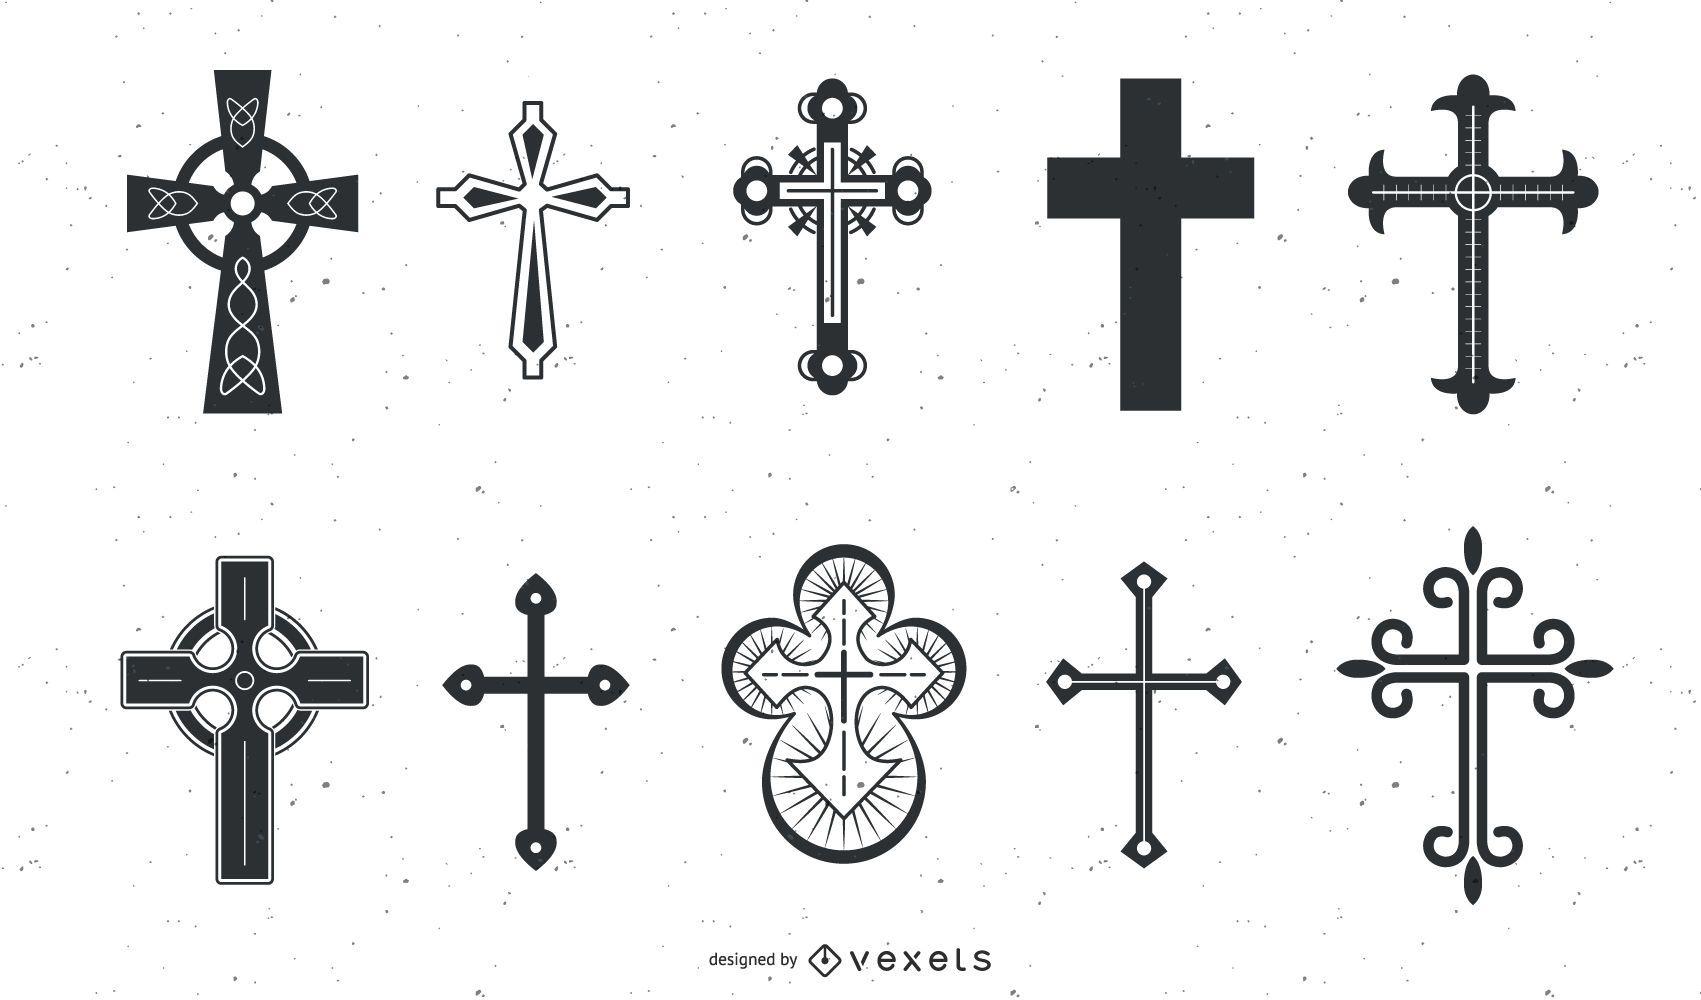 Simple & Stylish Cross Pack